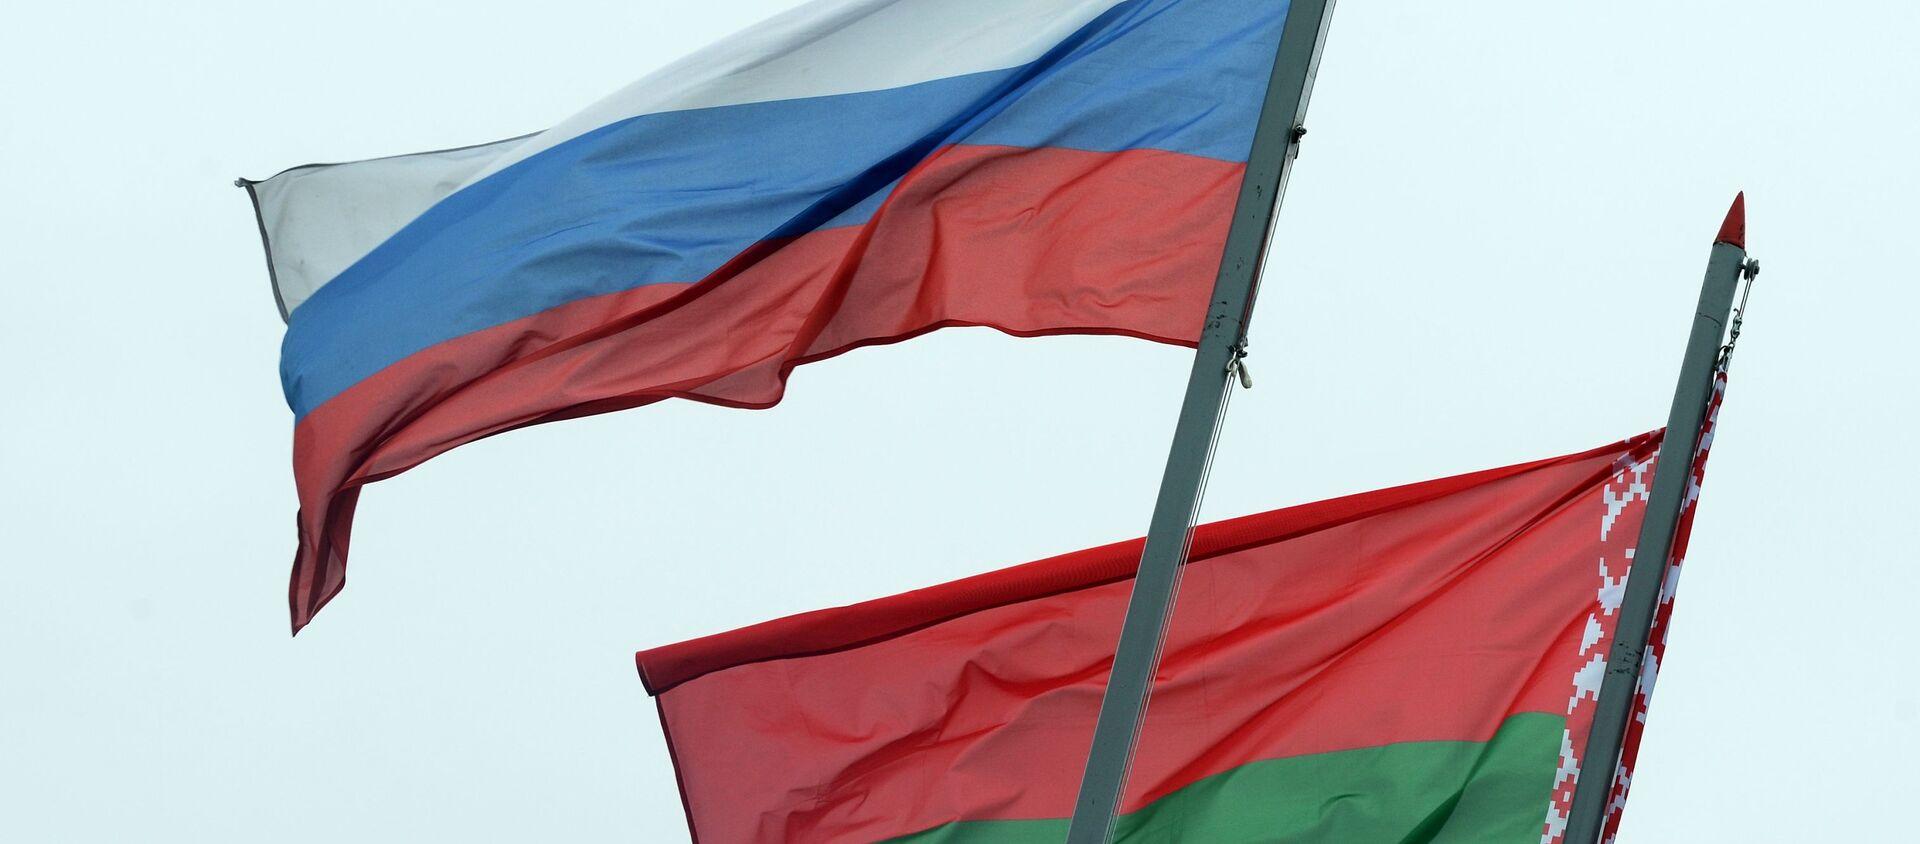 Флаги России и Беларуси - Sputnik Беларусь, 1920, 02.04.2021